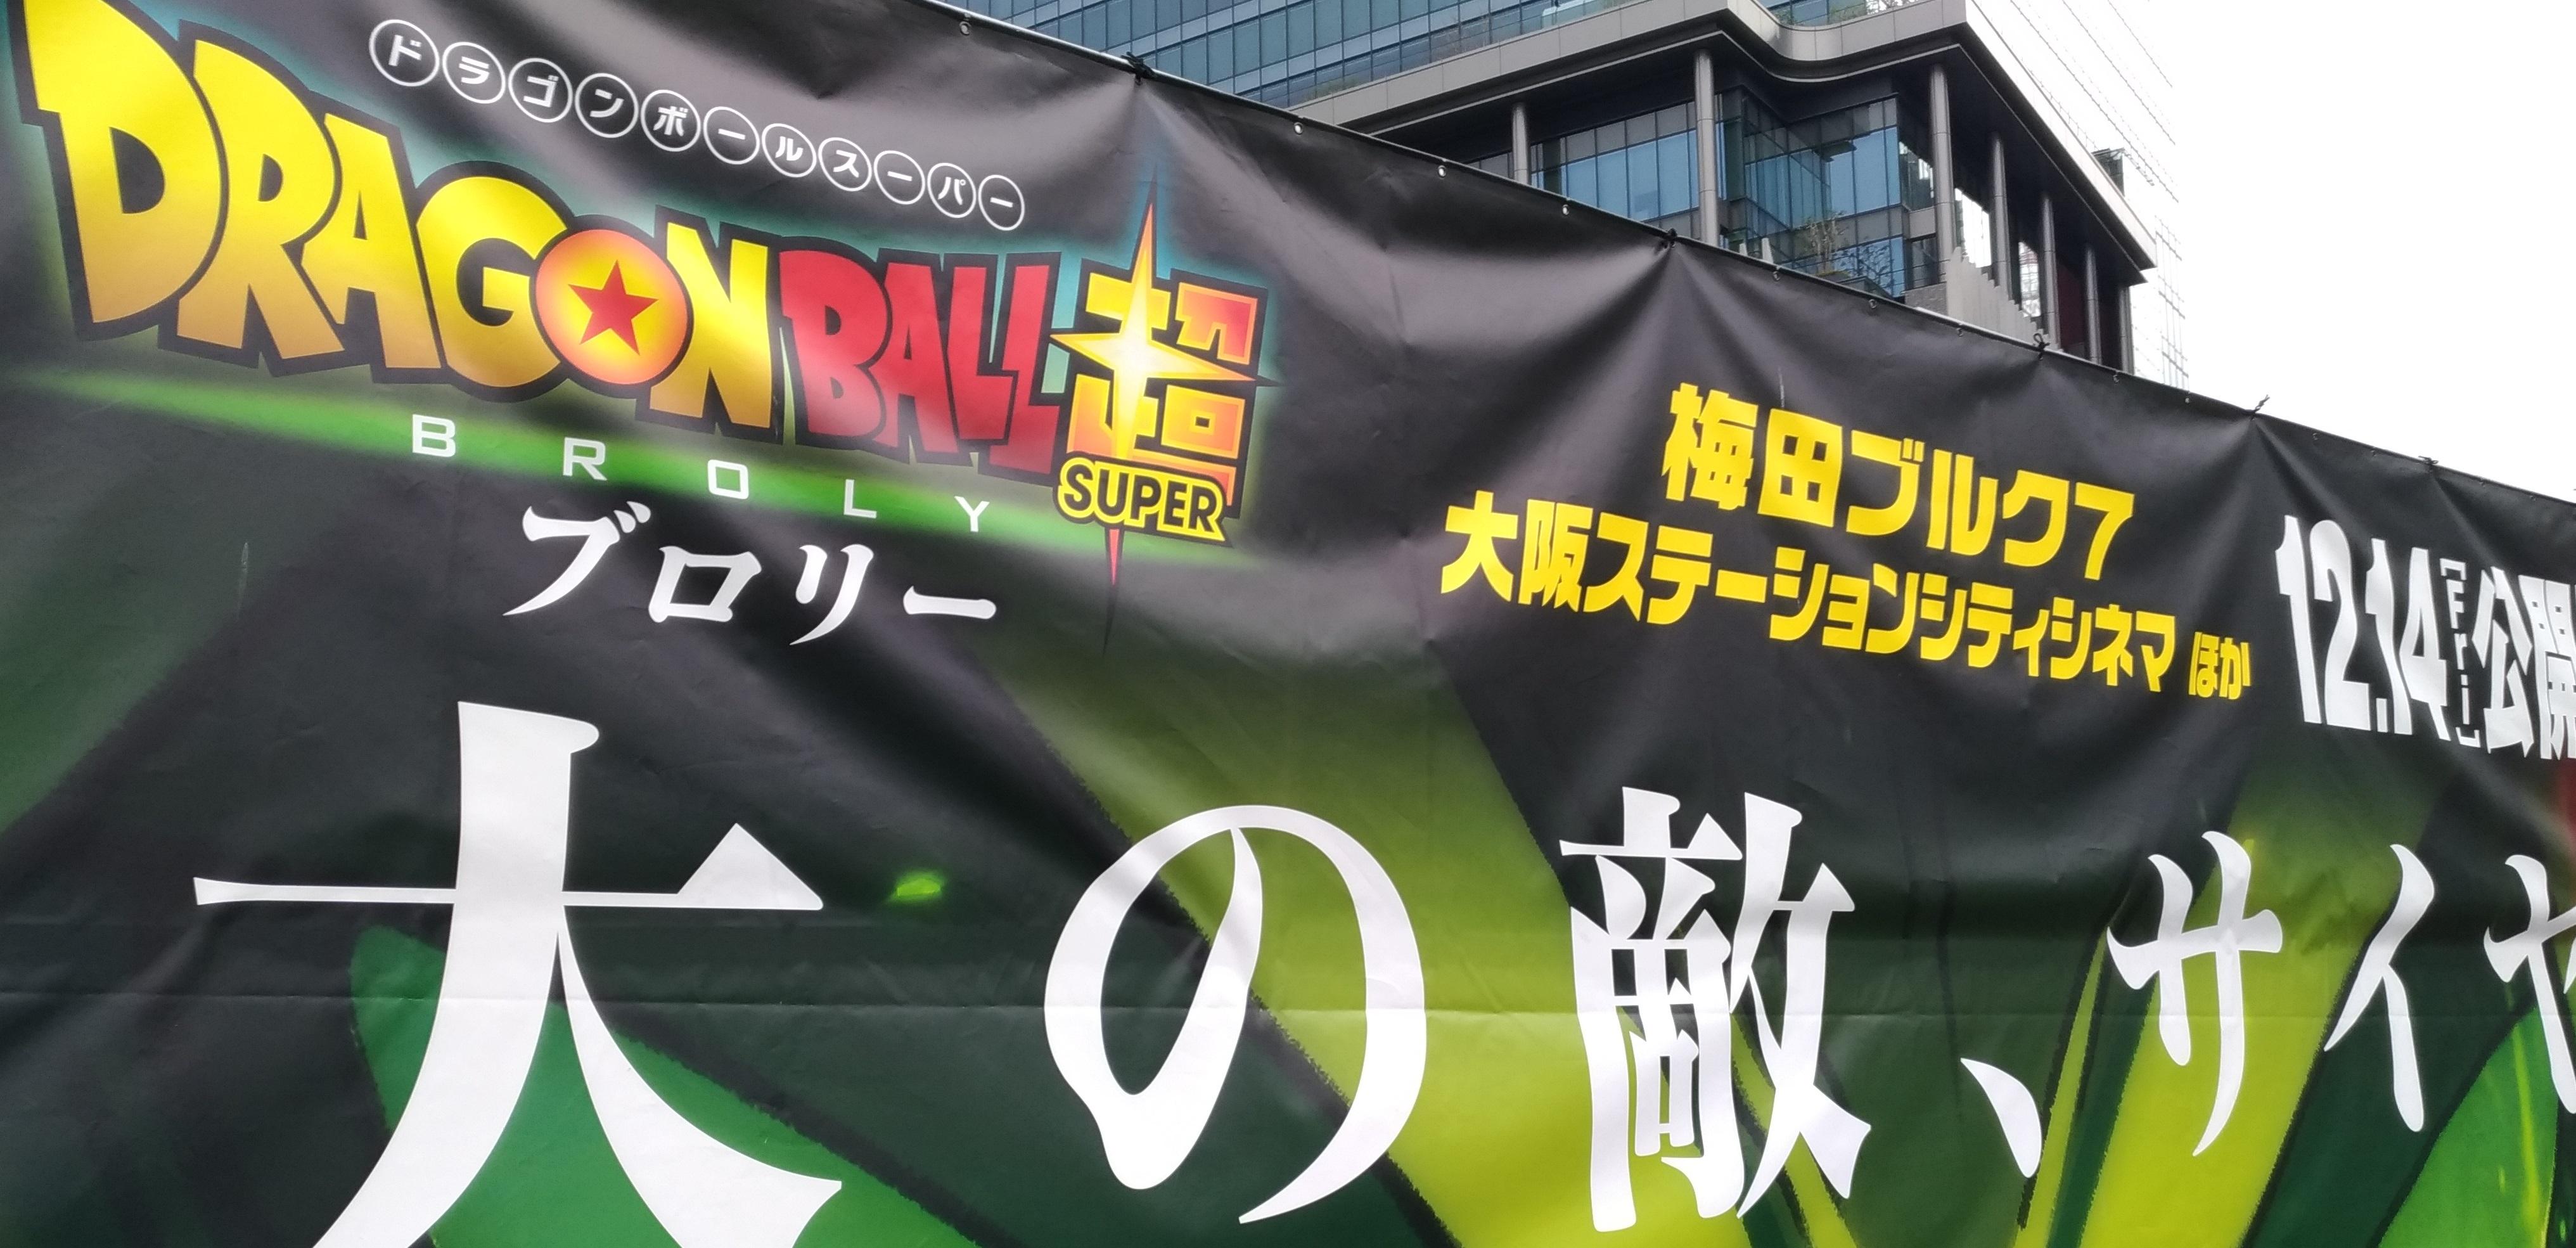 osaka_umeda_dragonball_super.jpg